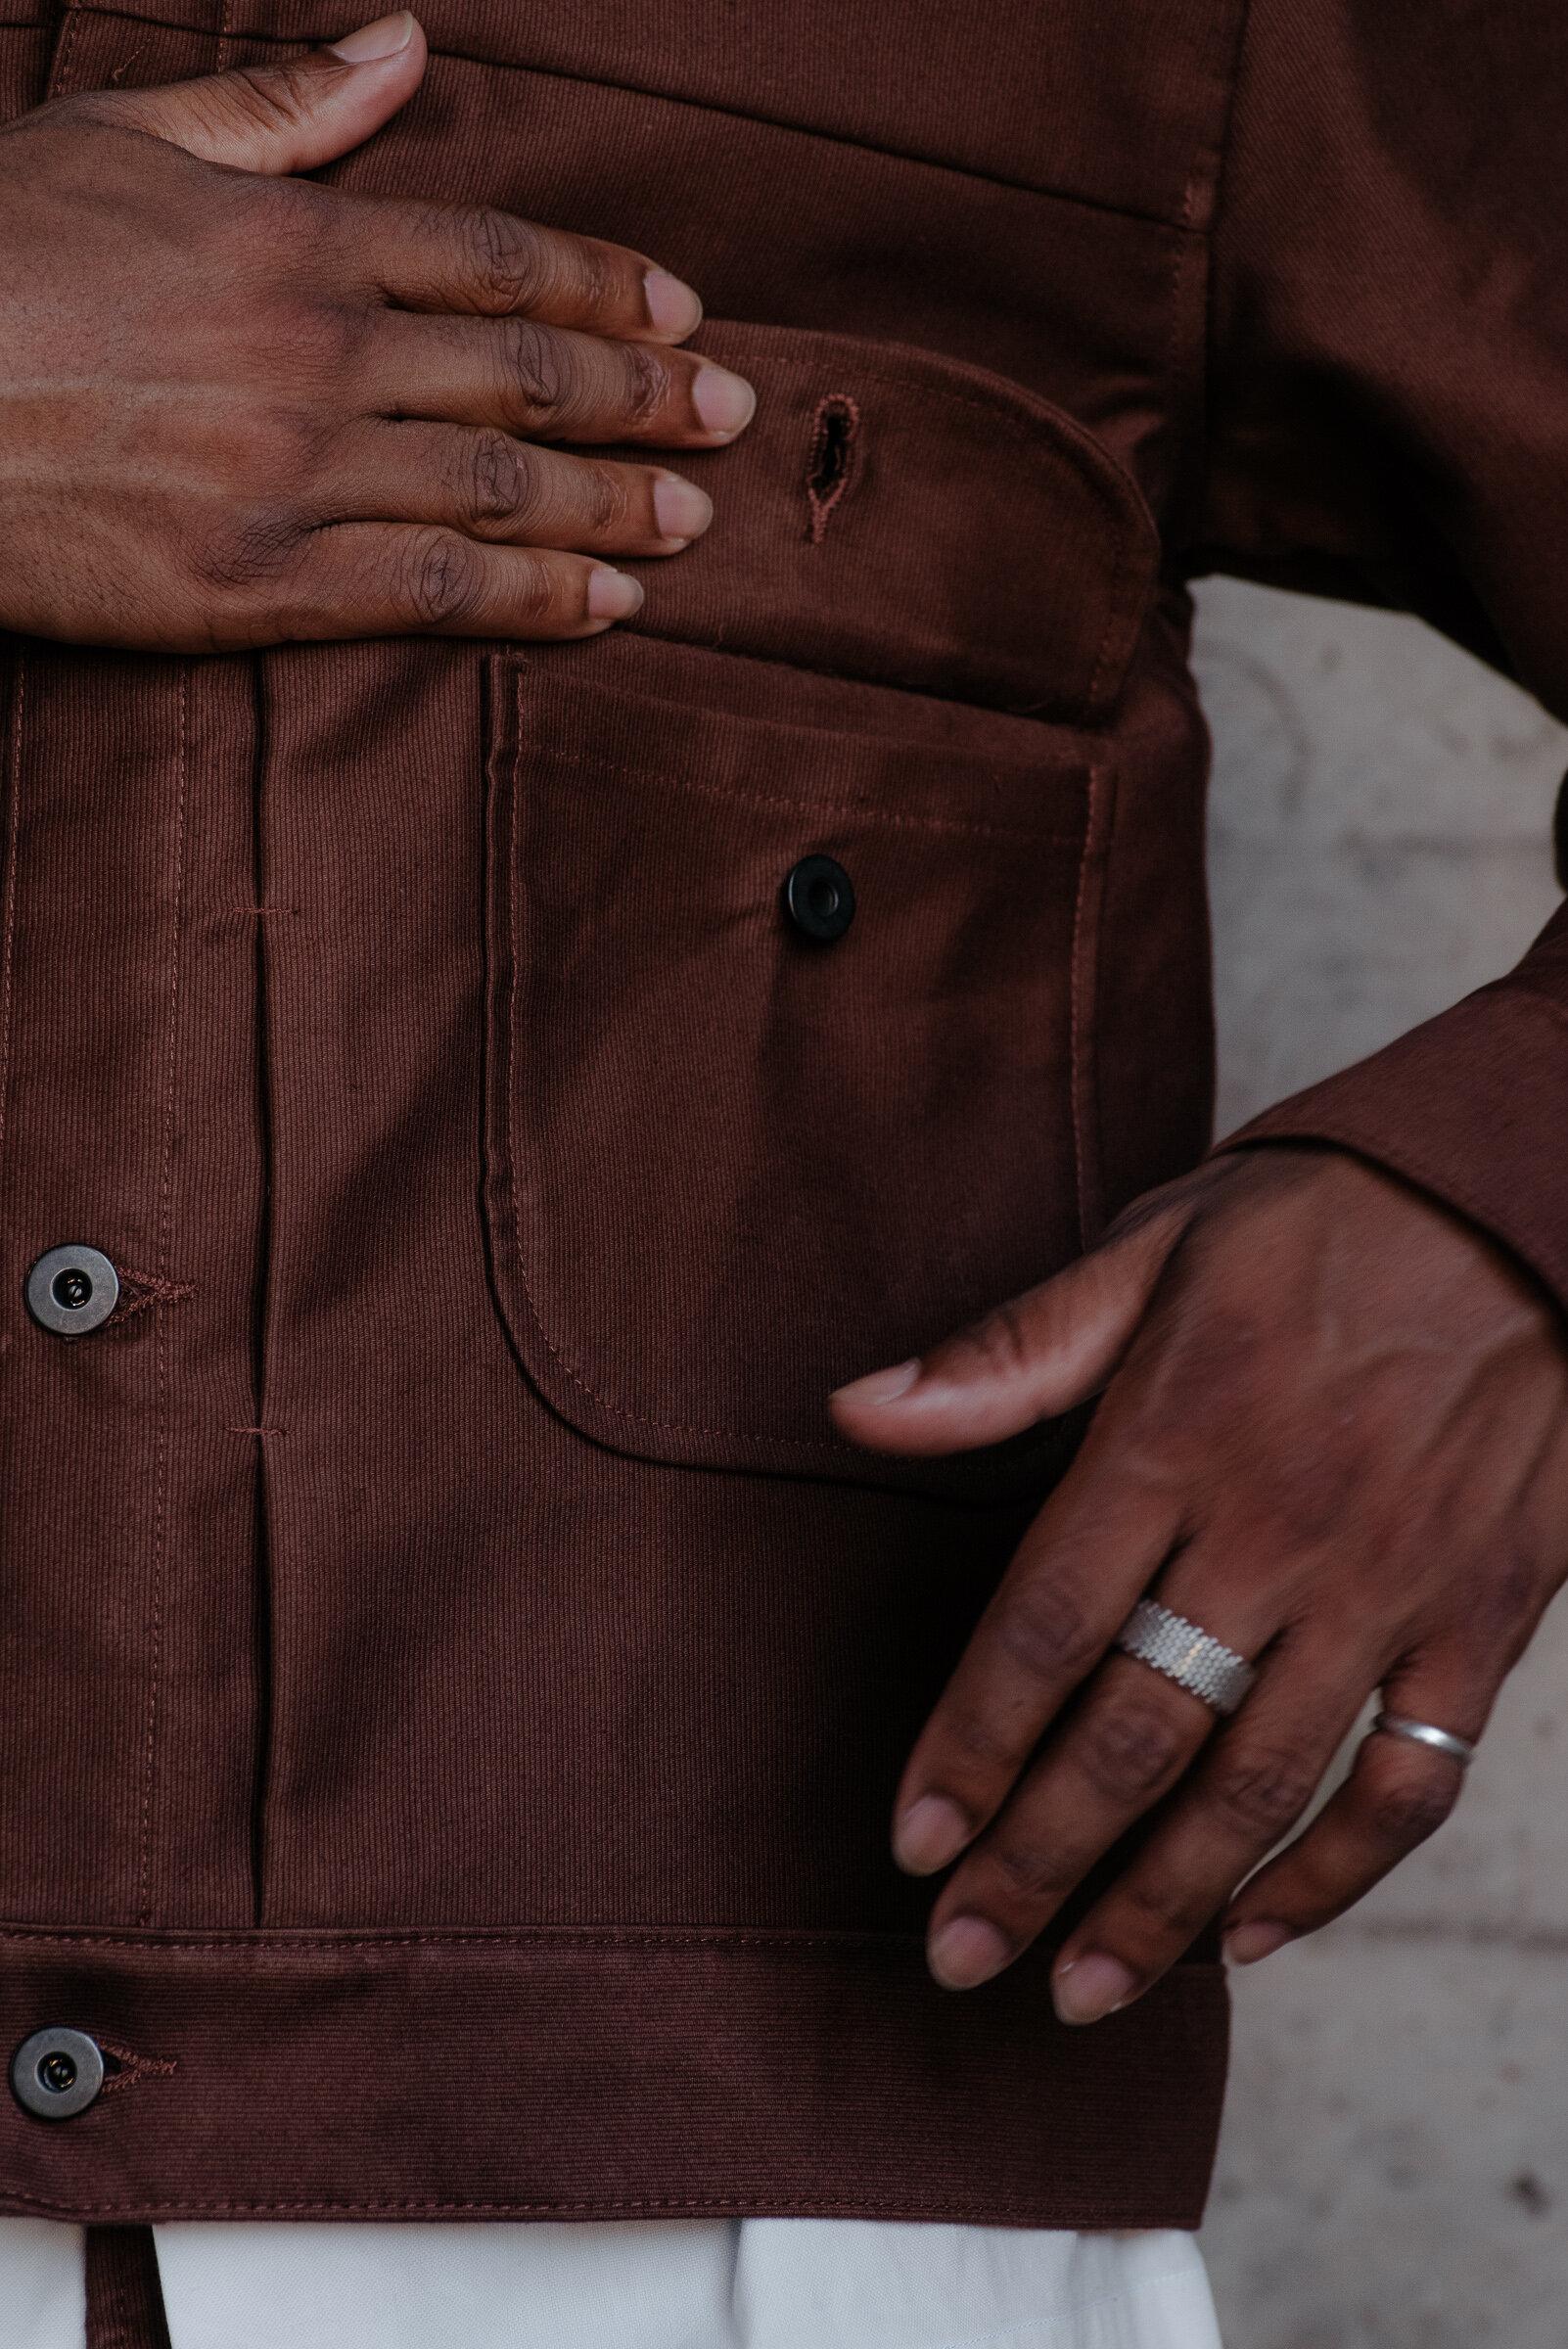 evan-kinori-pleated-jacket-bedford-cord-cotton-woven-in-japan-4